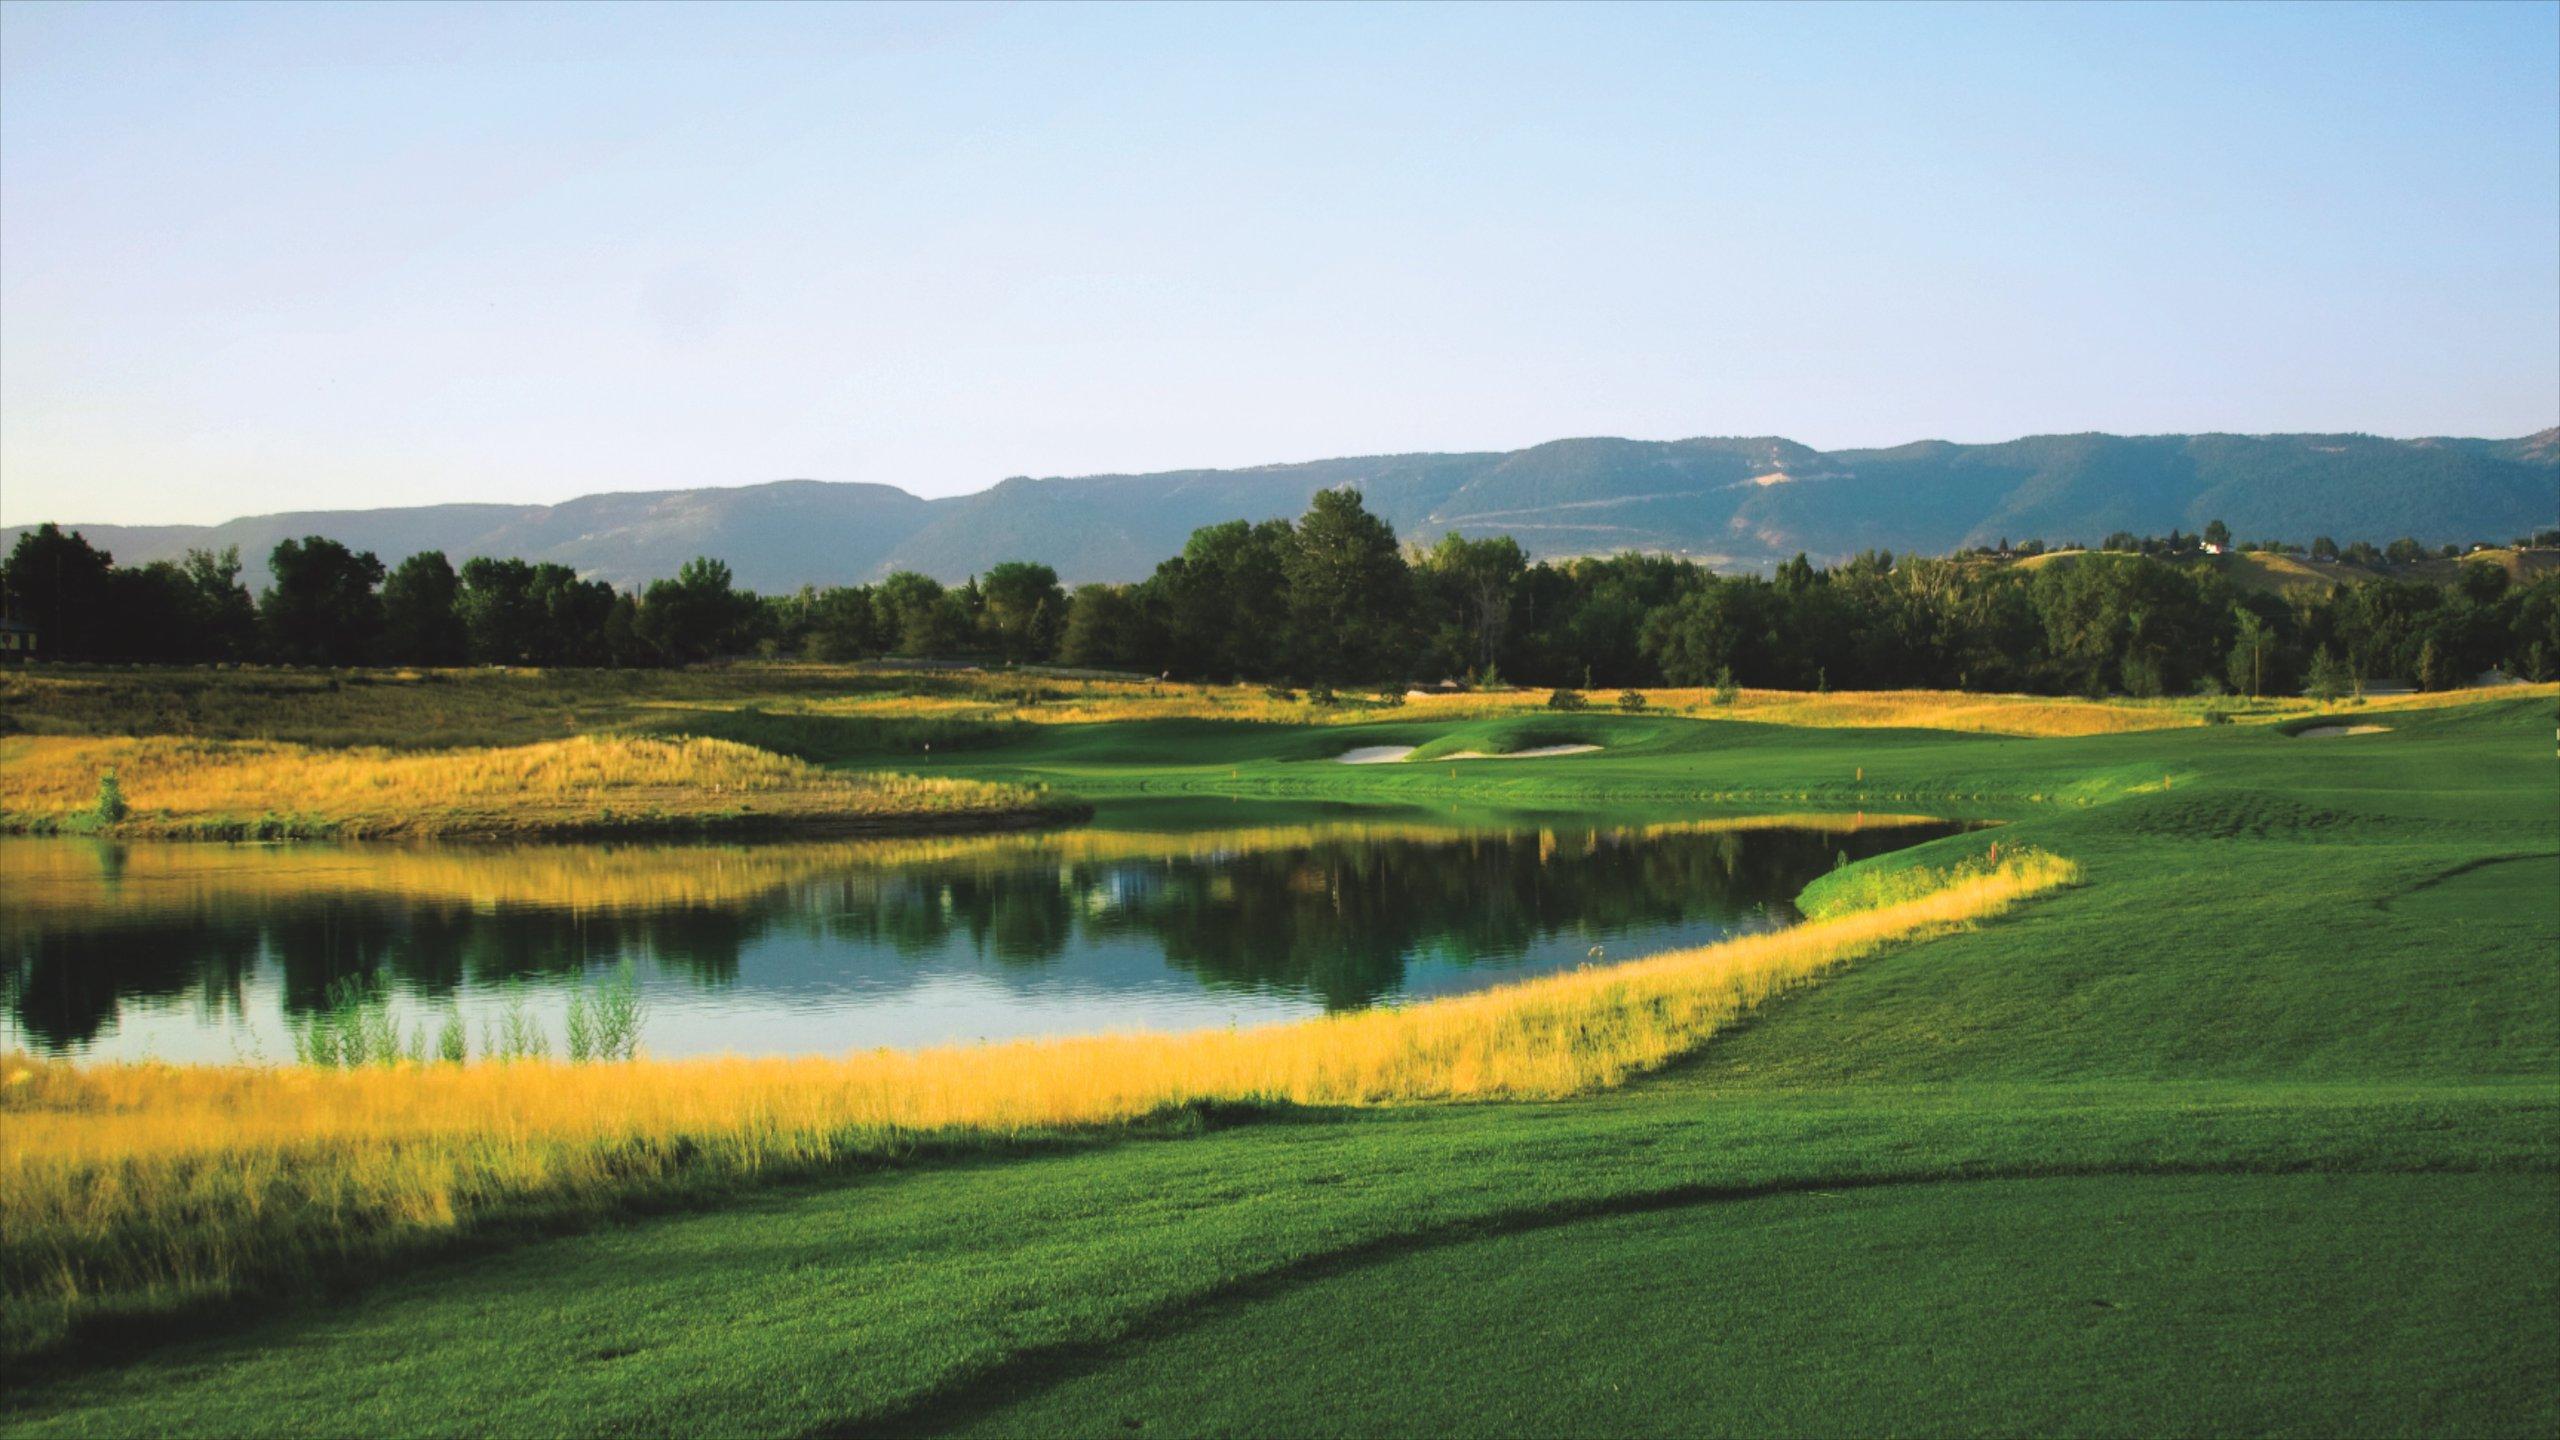 Casper featuring landscape views and golf